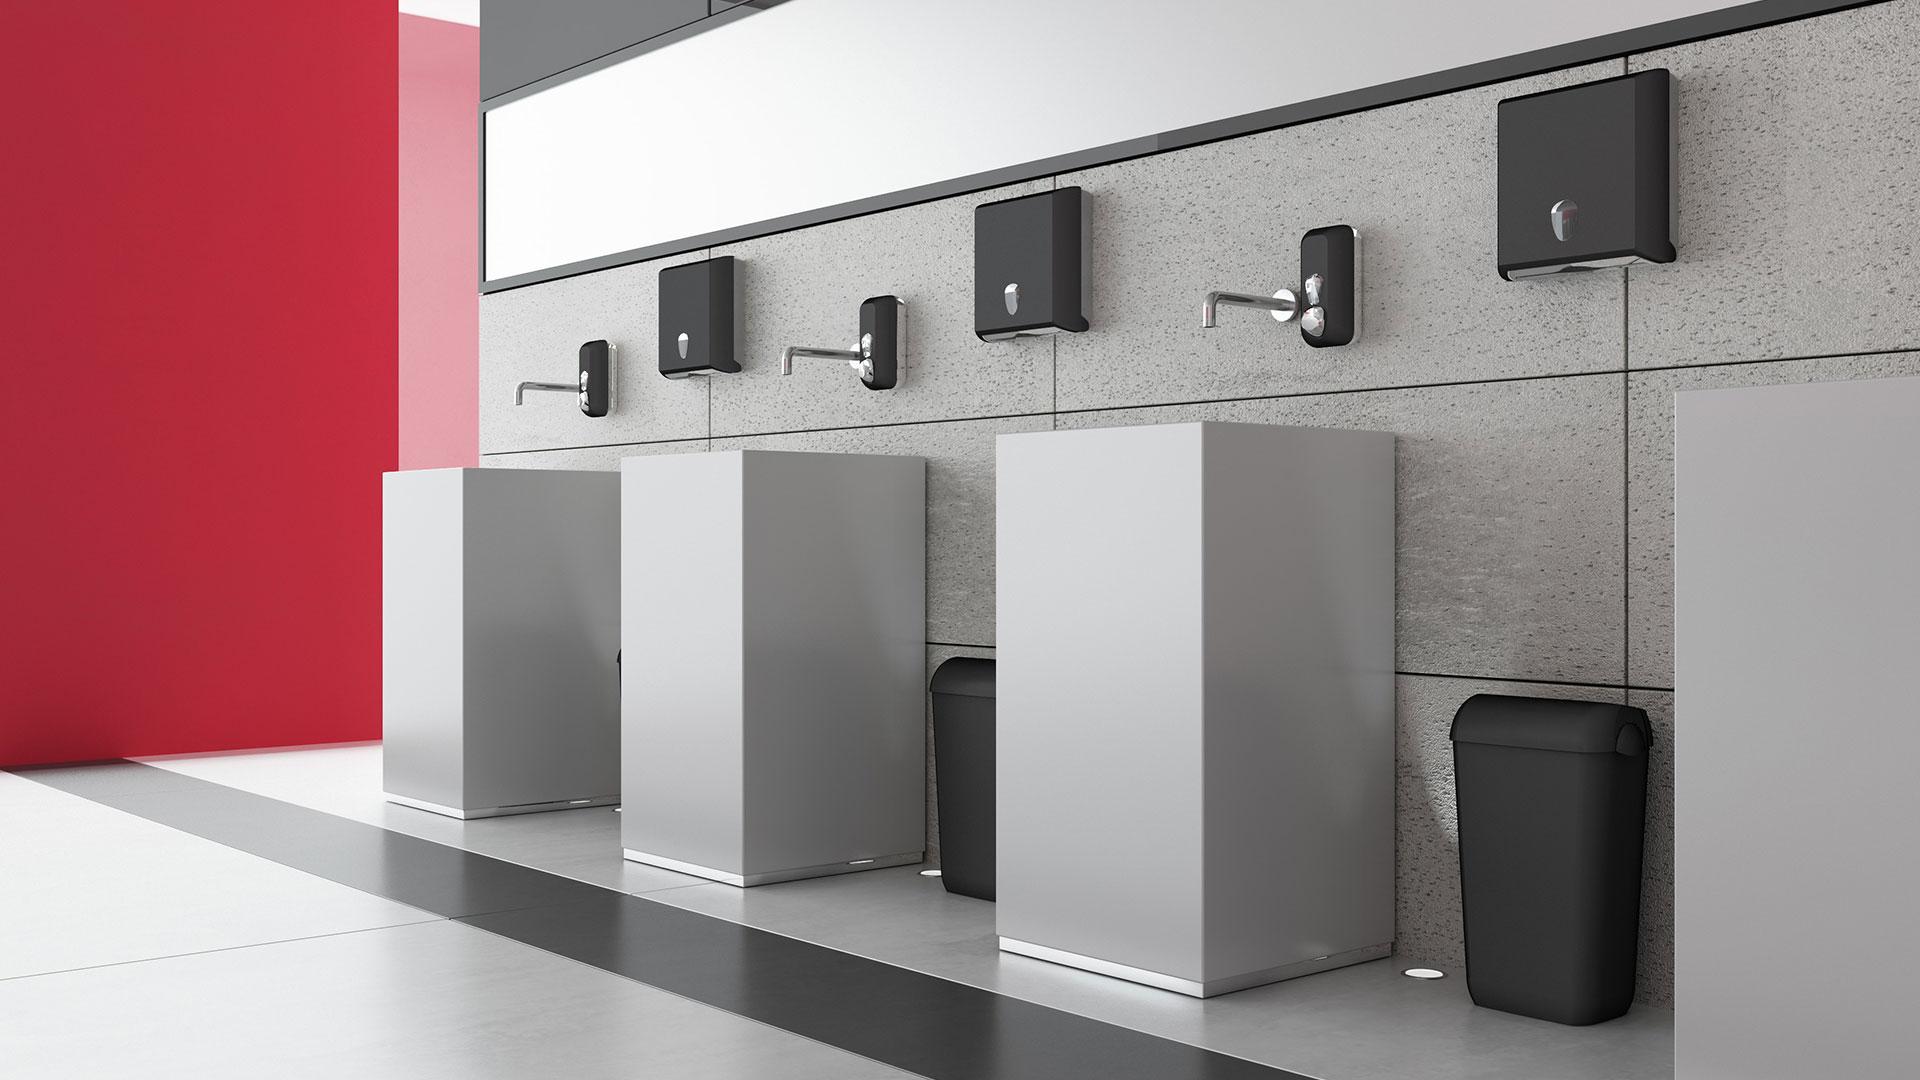 Washroom Products: Washroom Accessories & Bathroom Accessories